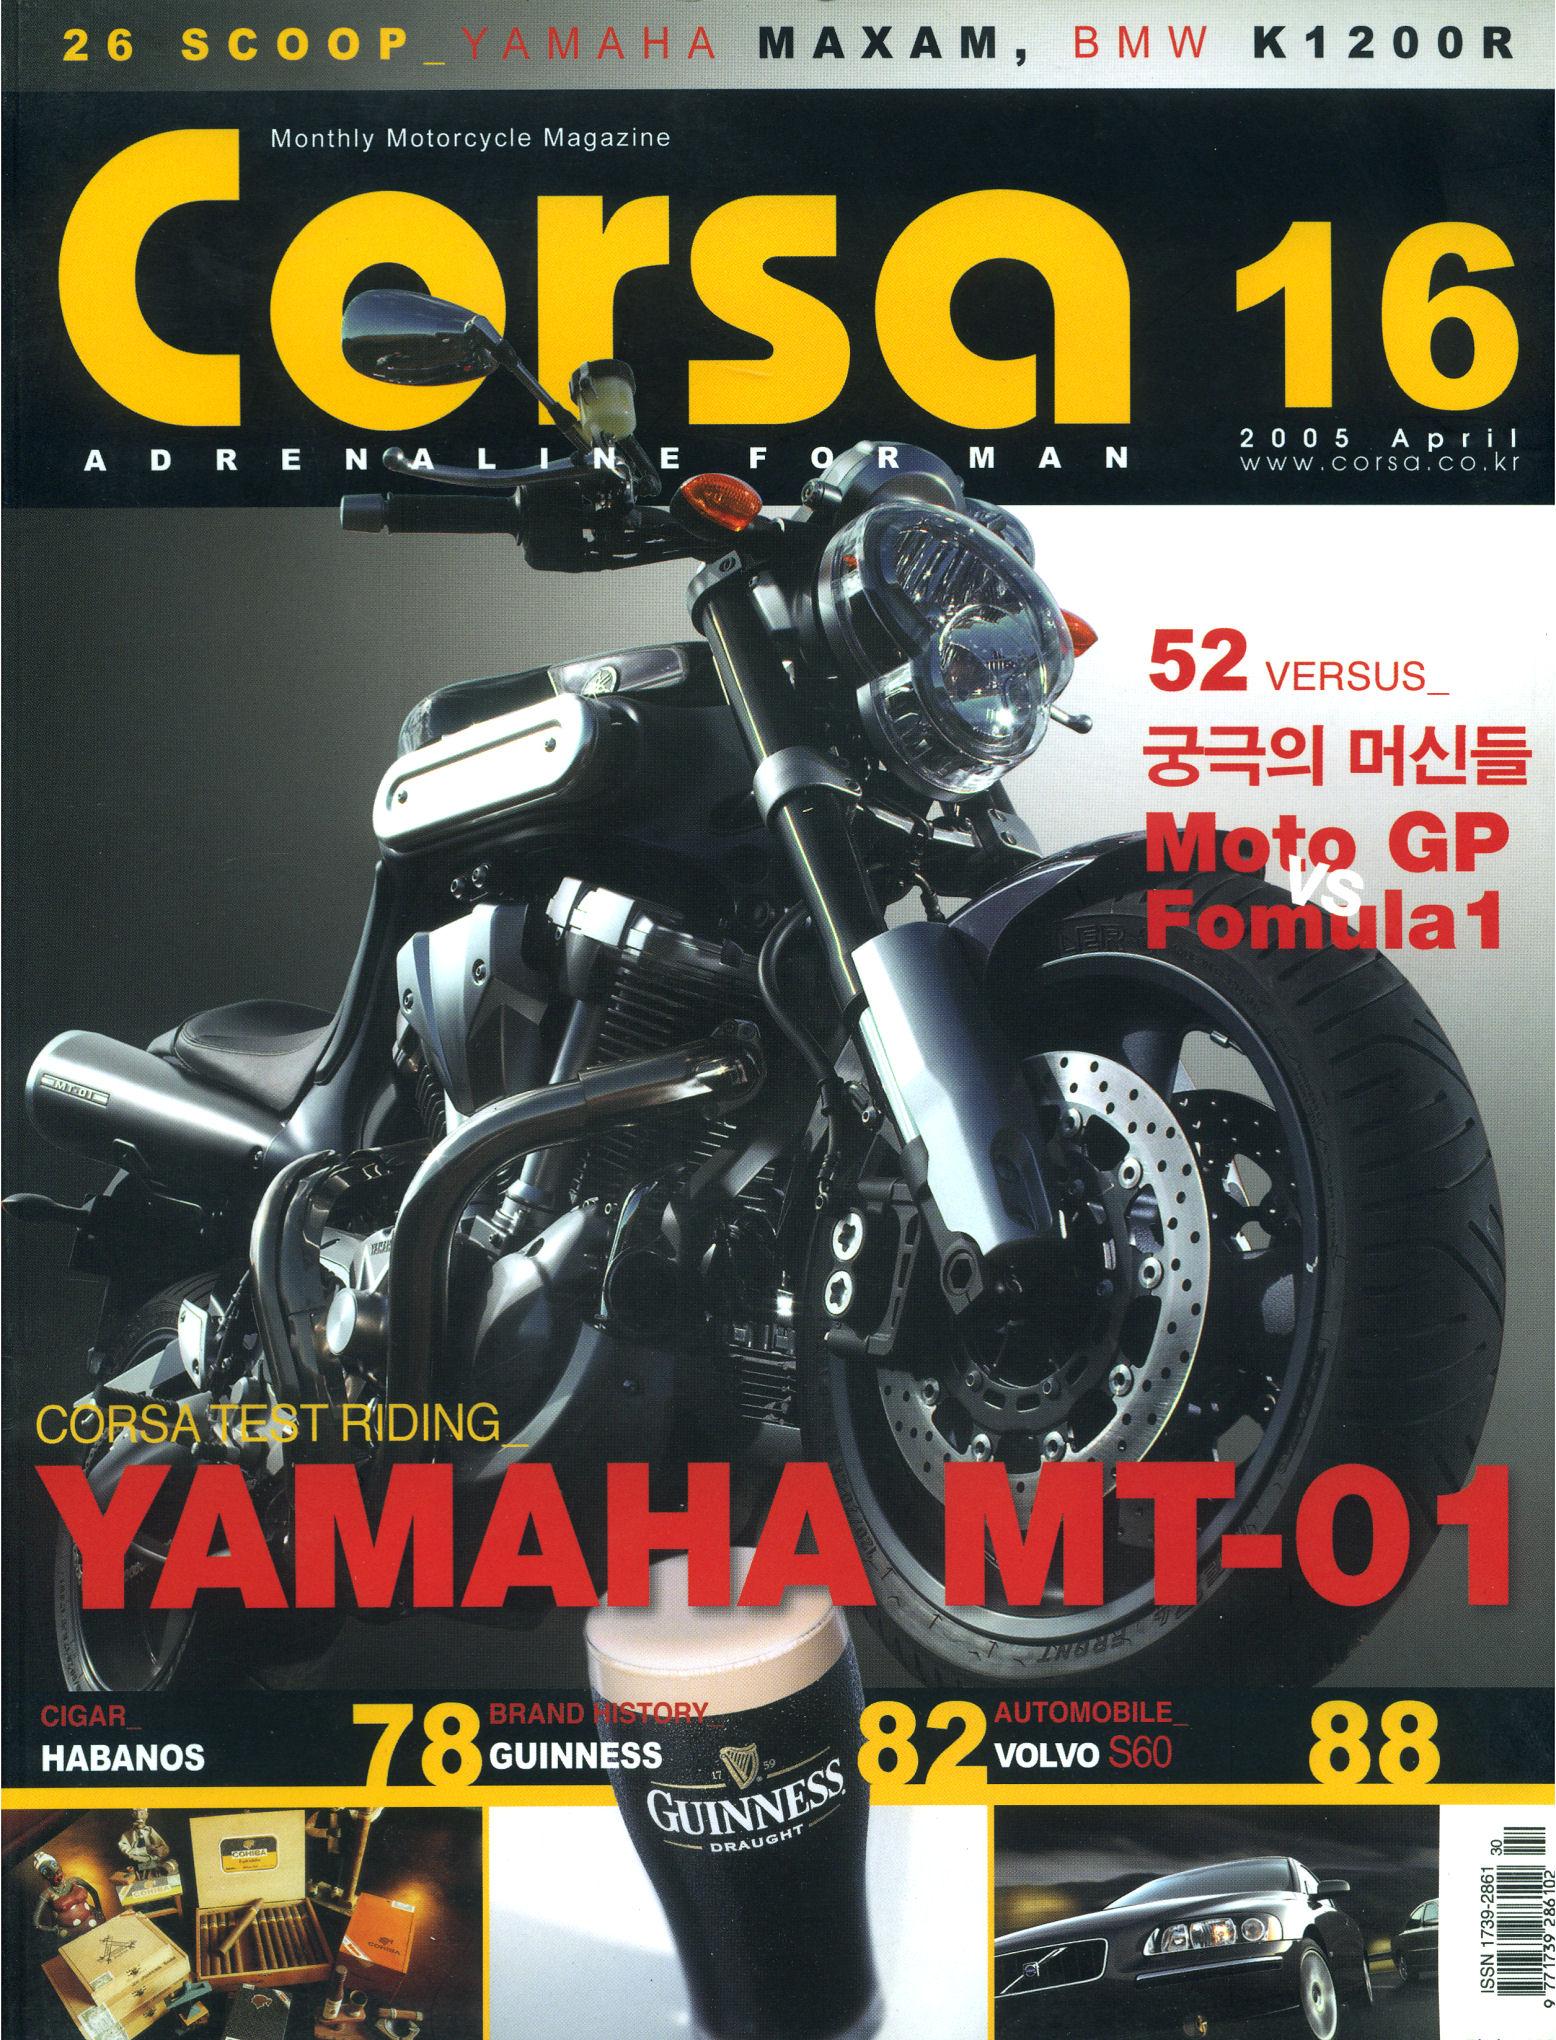 2005-4 Corsa cover.jpg